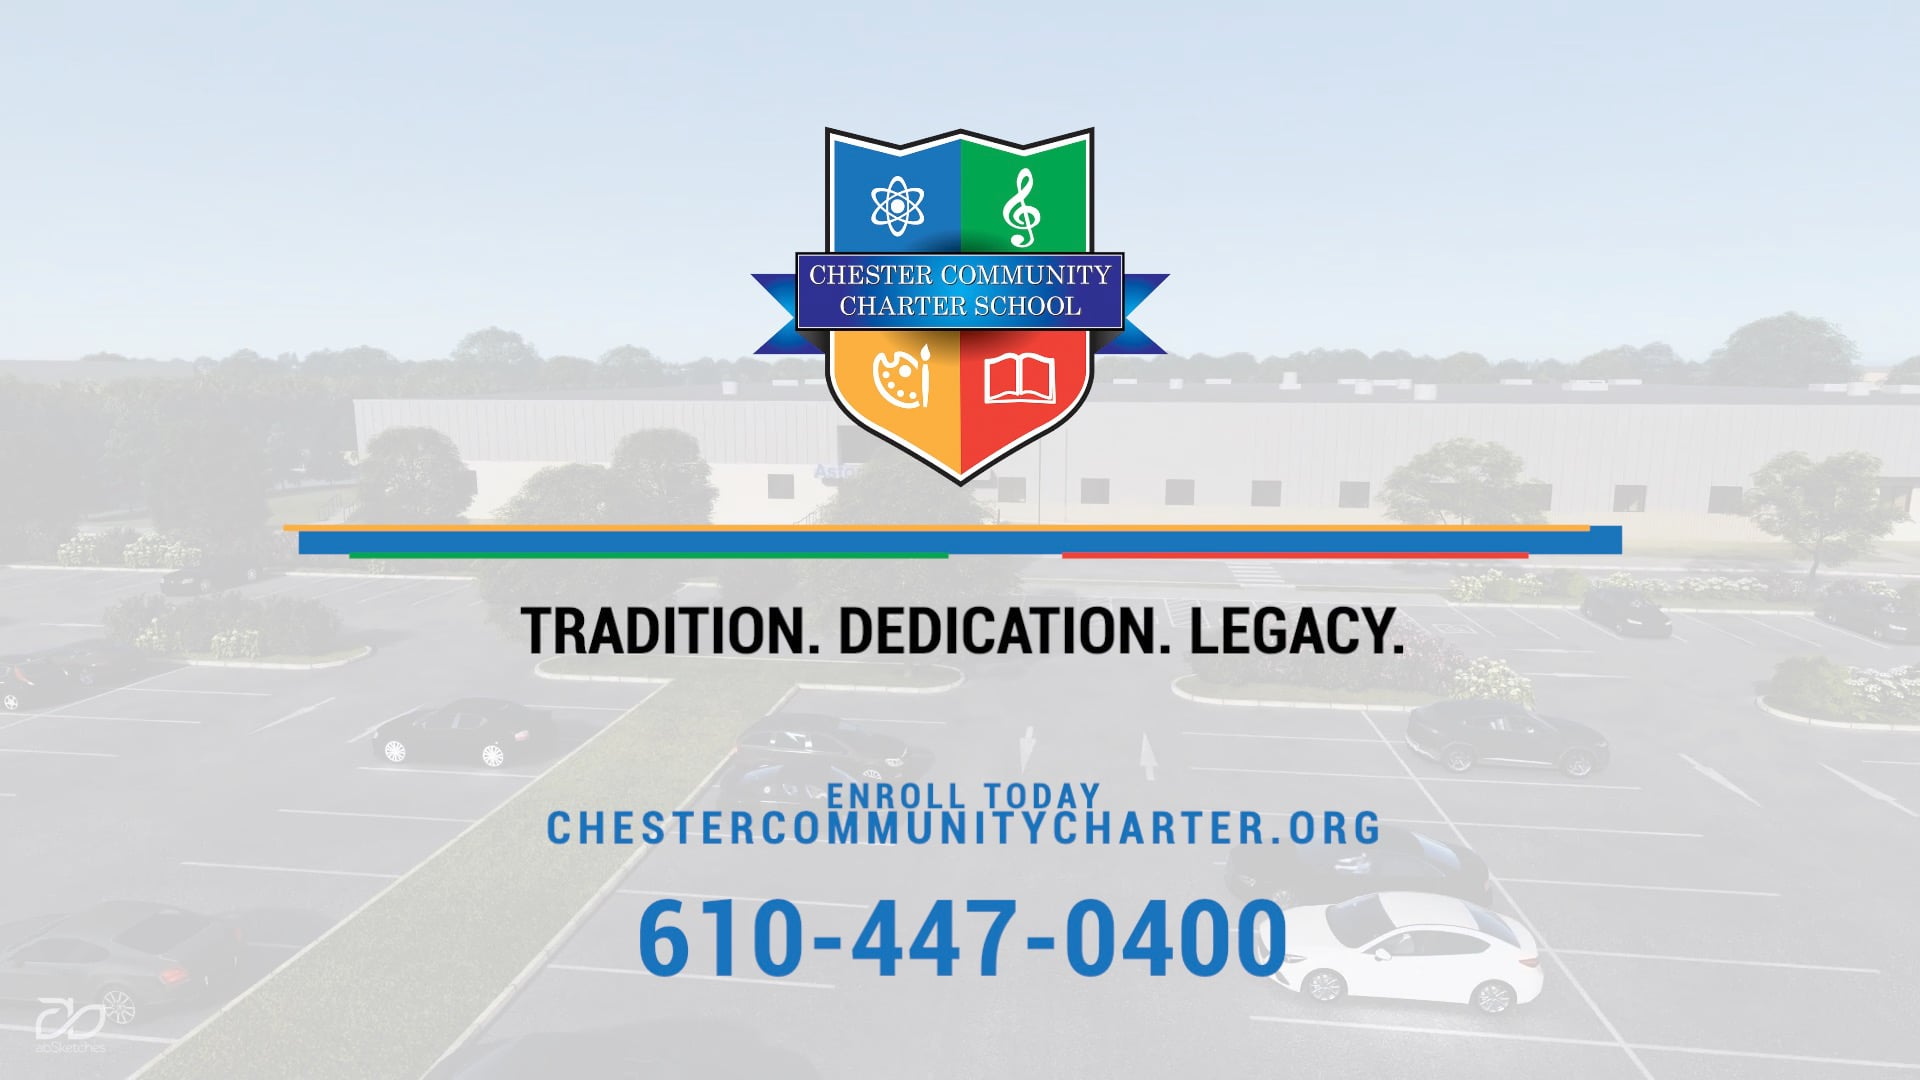 CHESTER COMMUNITY CHARTER SCHOOL